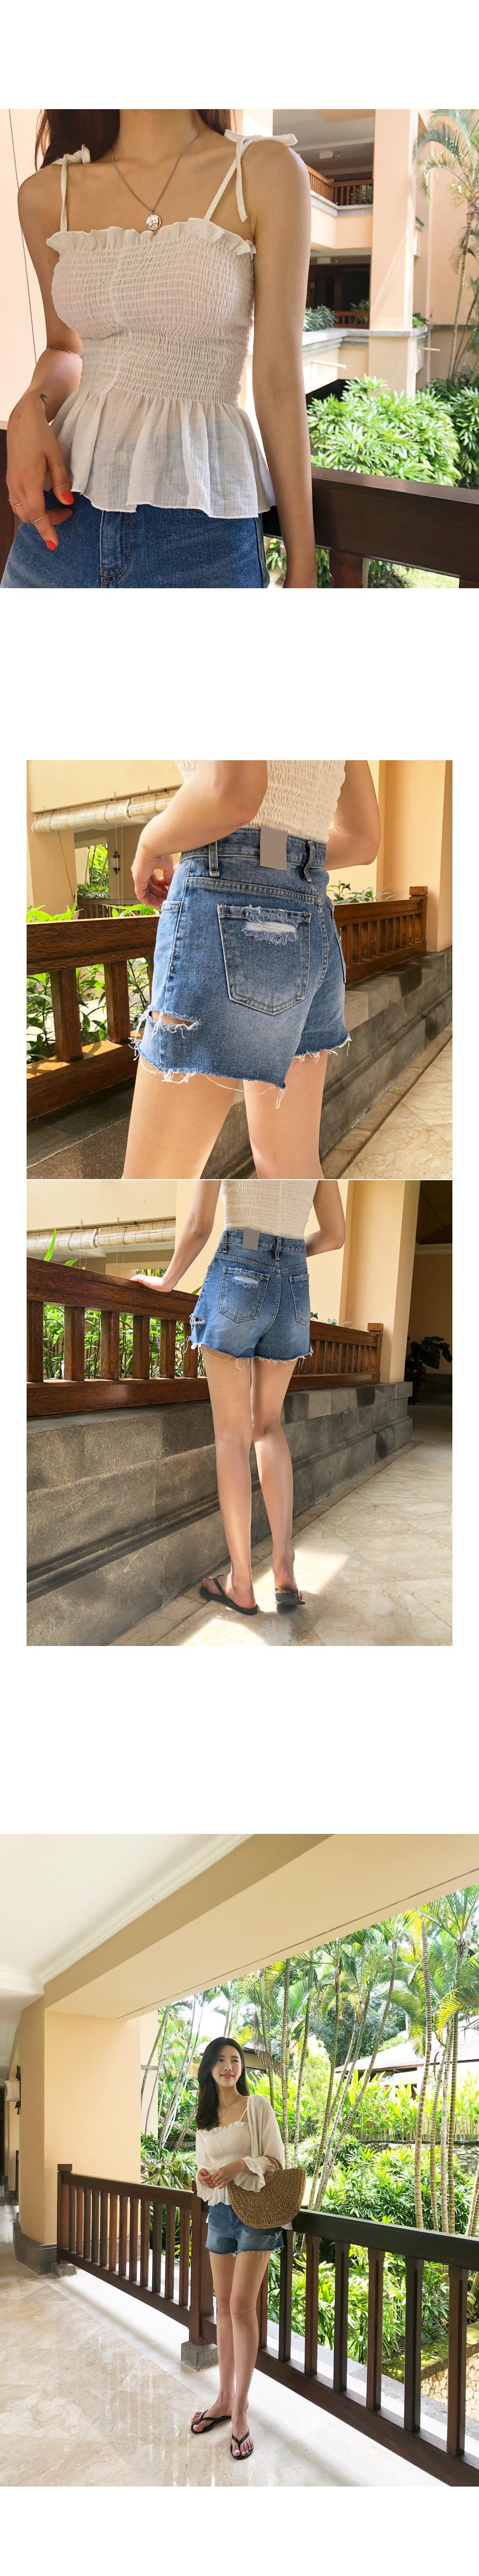 Top turnoff pants